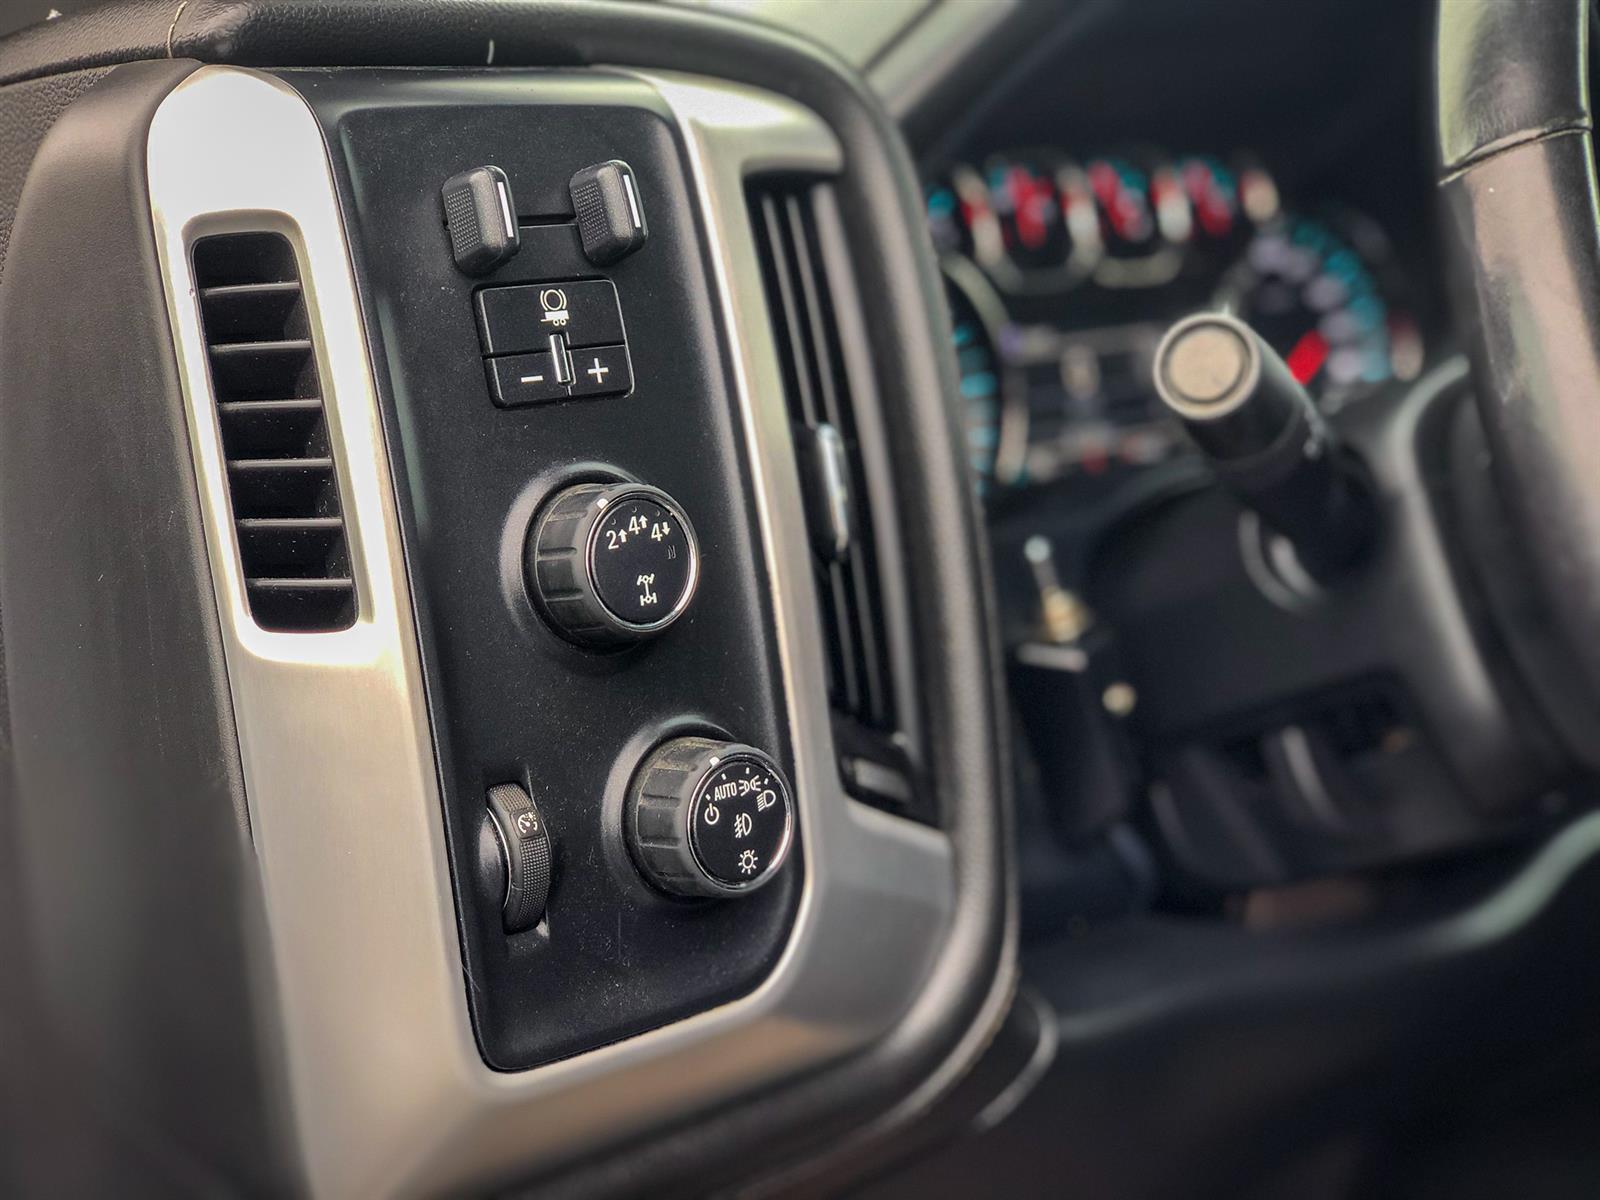 2017 GMC Sierra 2500 HD SLE | 6.0L V8 | 4X4 | POWERED/HEATED-SEATS | BACK-UP CAMERA